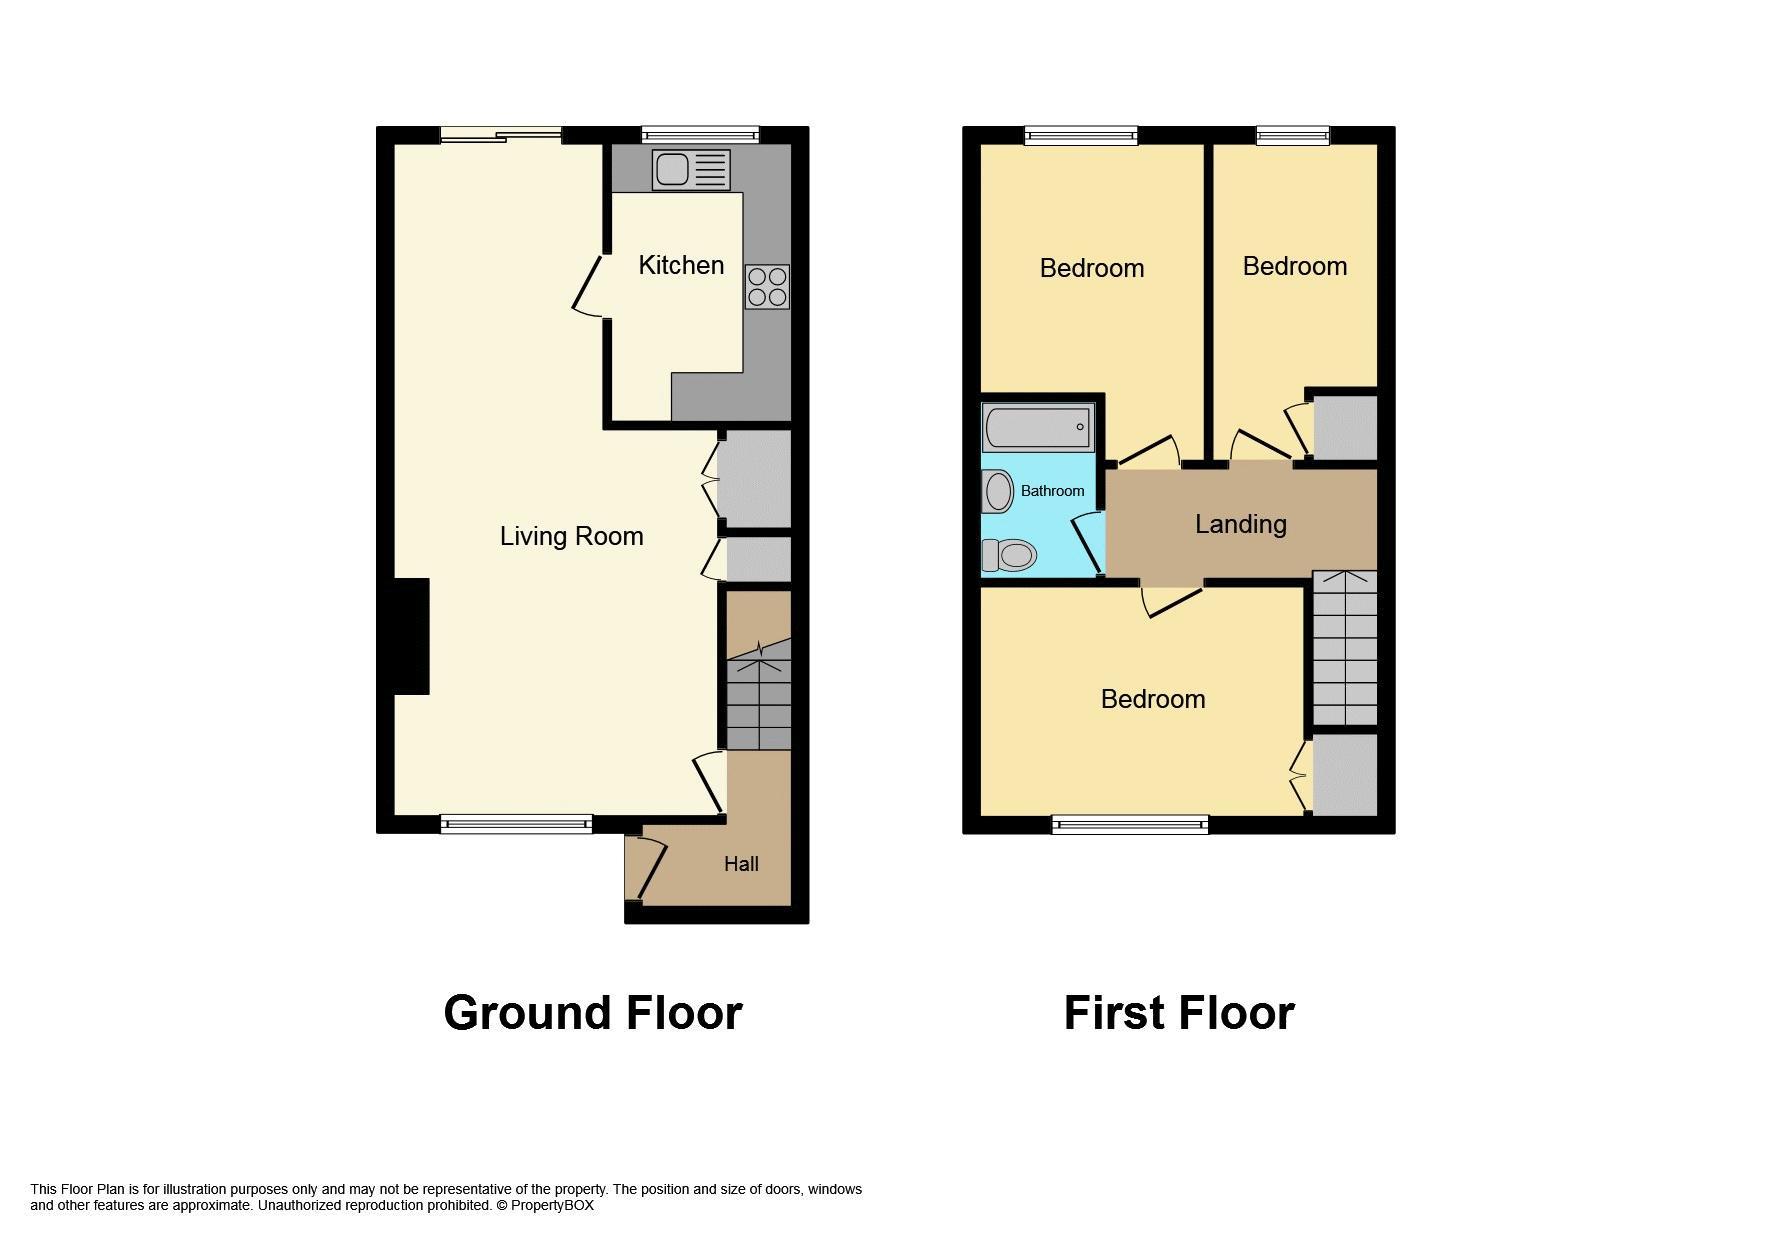 27 Bourn Rise Floorplan